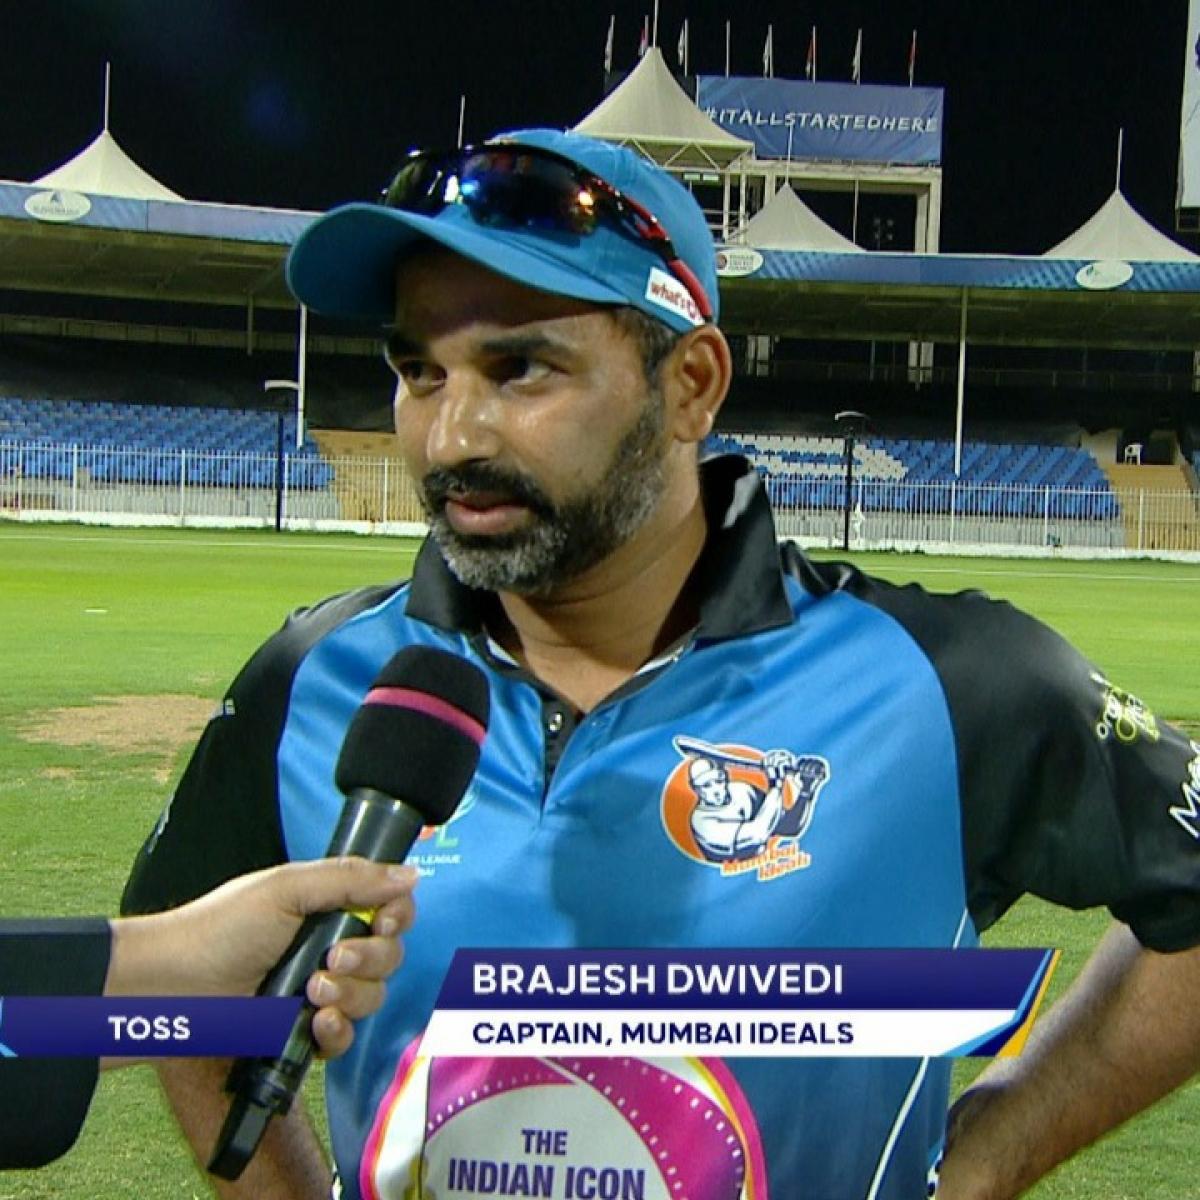 Mumbai Ideals team captain Brajesh Dwivedi